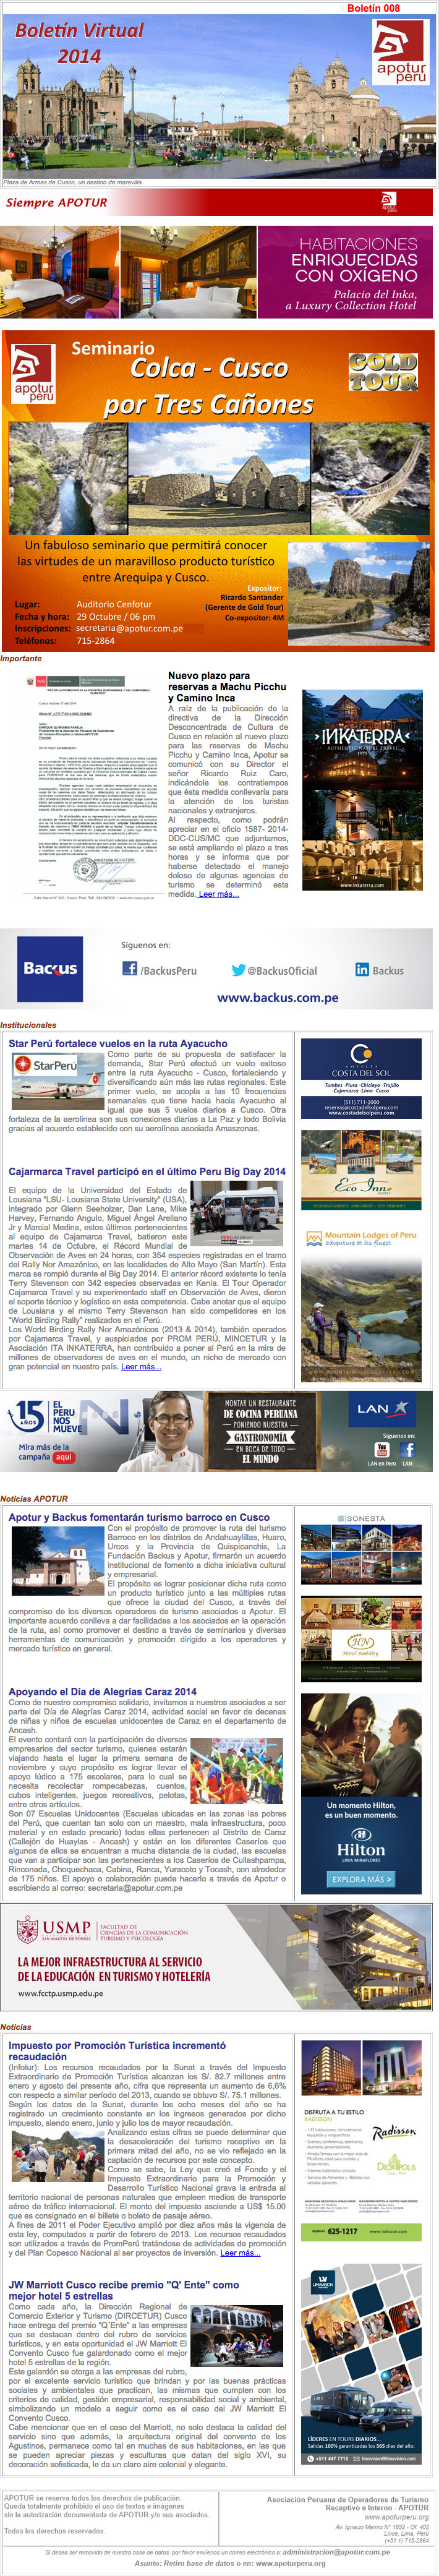 Boletín Apotur N° 8 - Octubre 2014